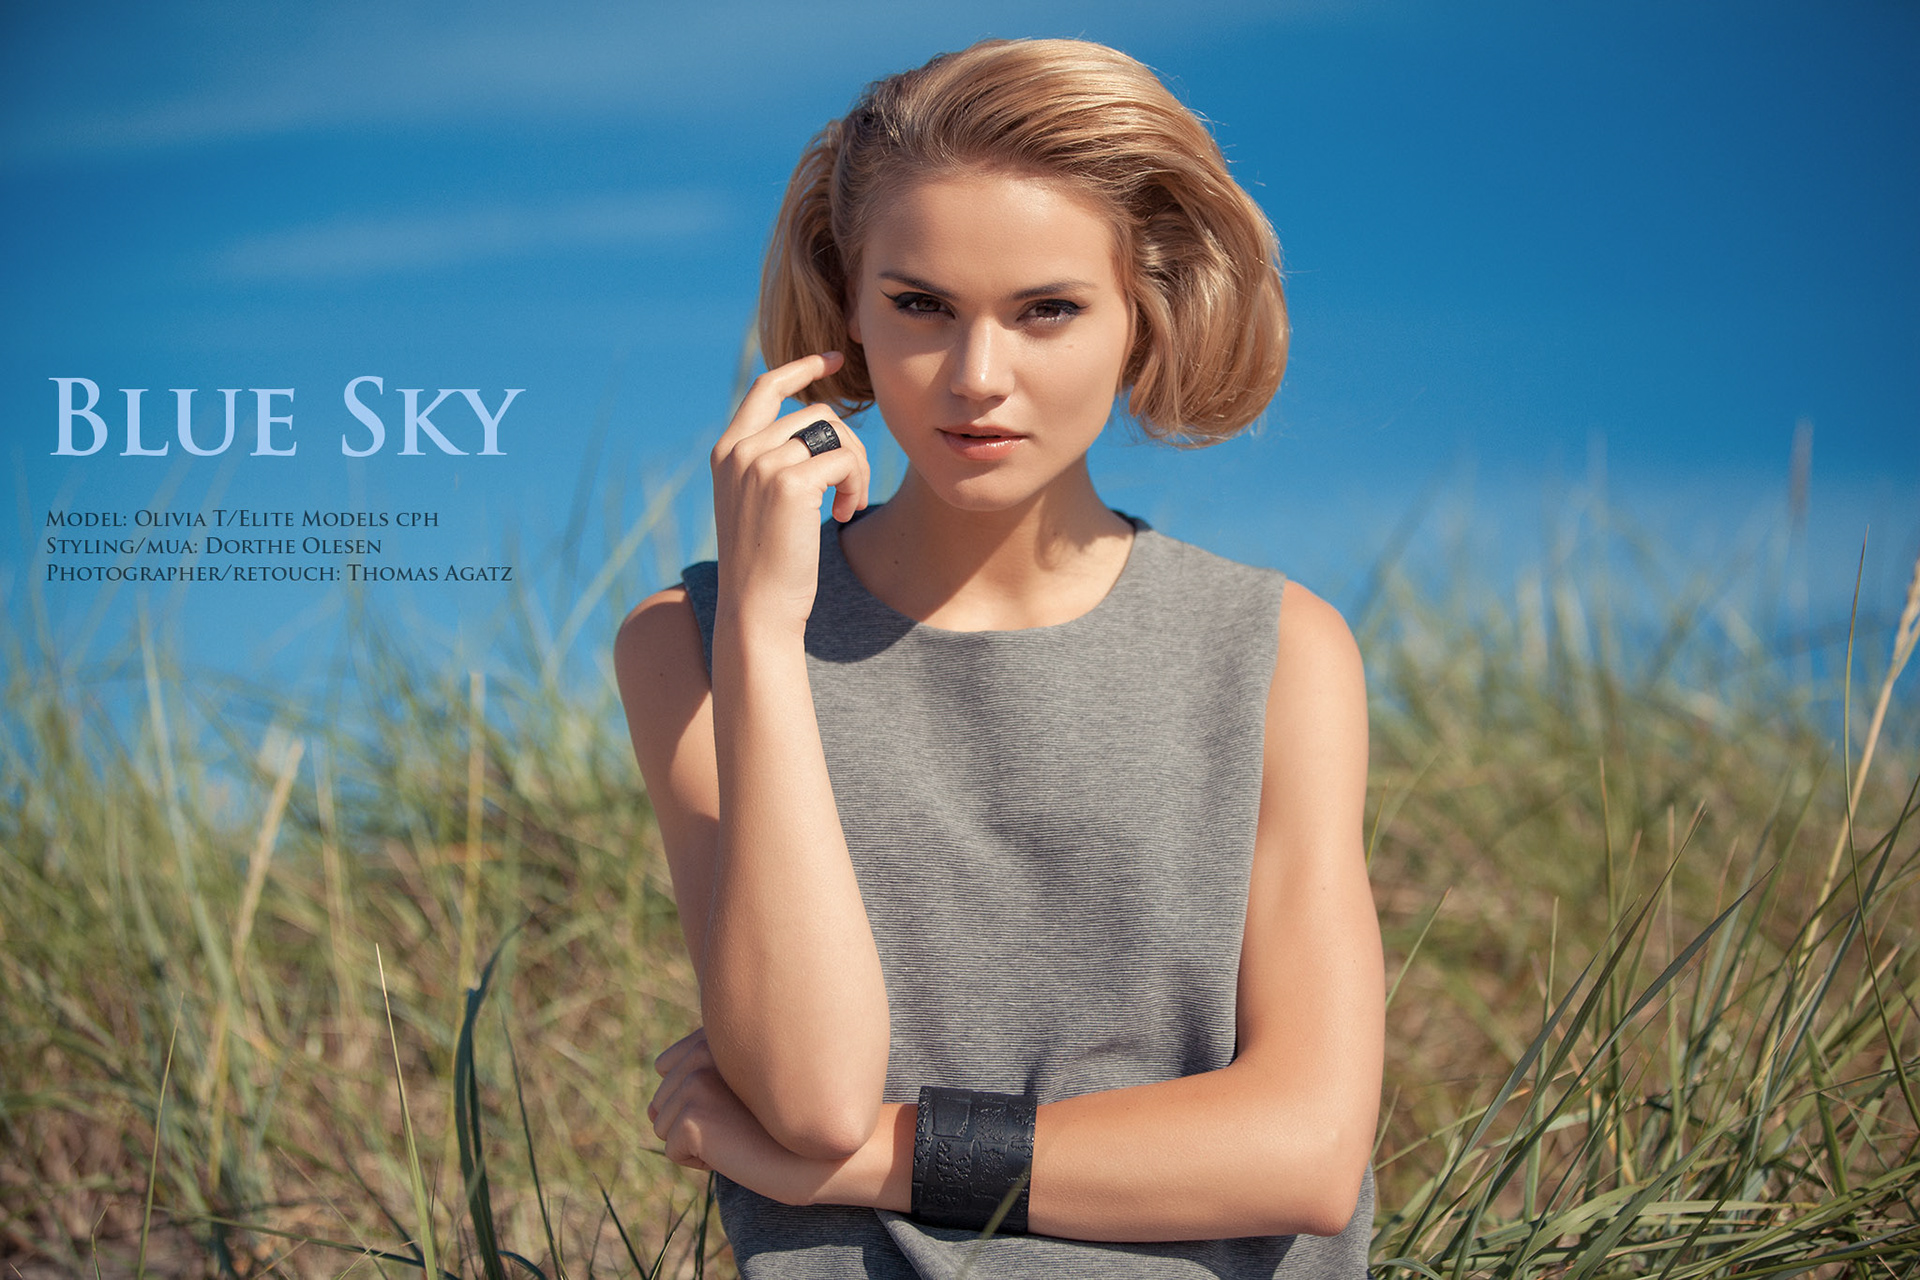 Model: Camilla Bauer - Fotograf: Thomas Agatz ‹ ADO Style